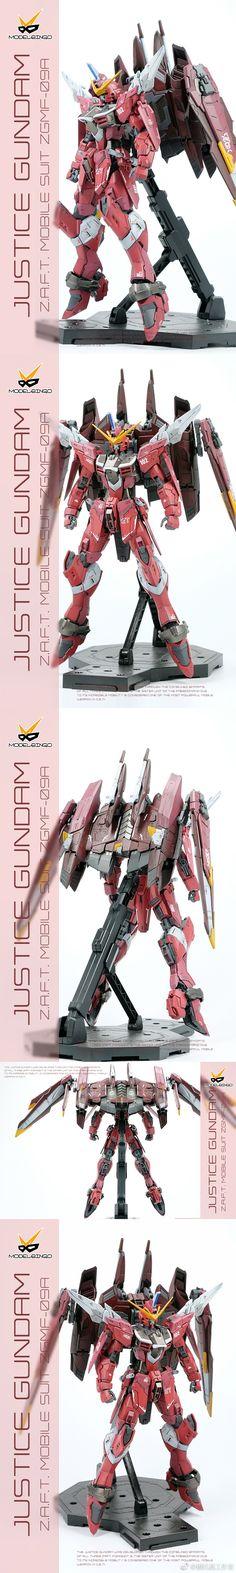 Gundam Wing, Gundam Art, Sf Movies, Sci Fi Models, Gundam Seed, Gunpla Custom, Gundam Model, Warhammer 40000, Mobile Suit